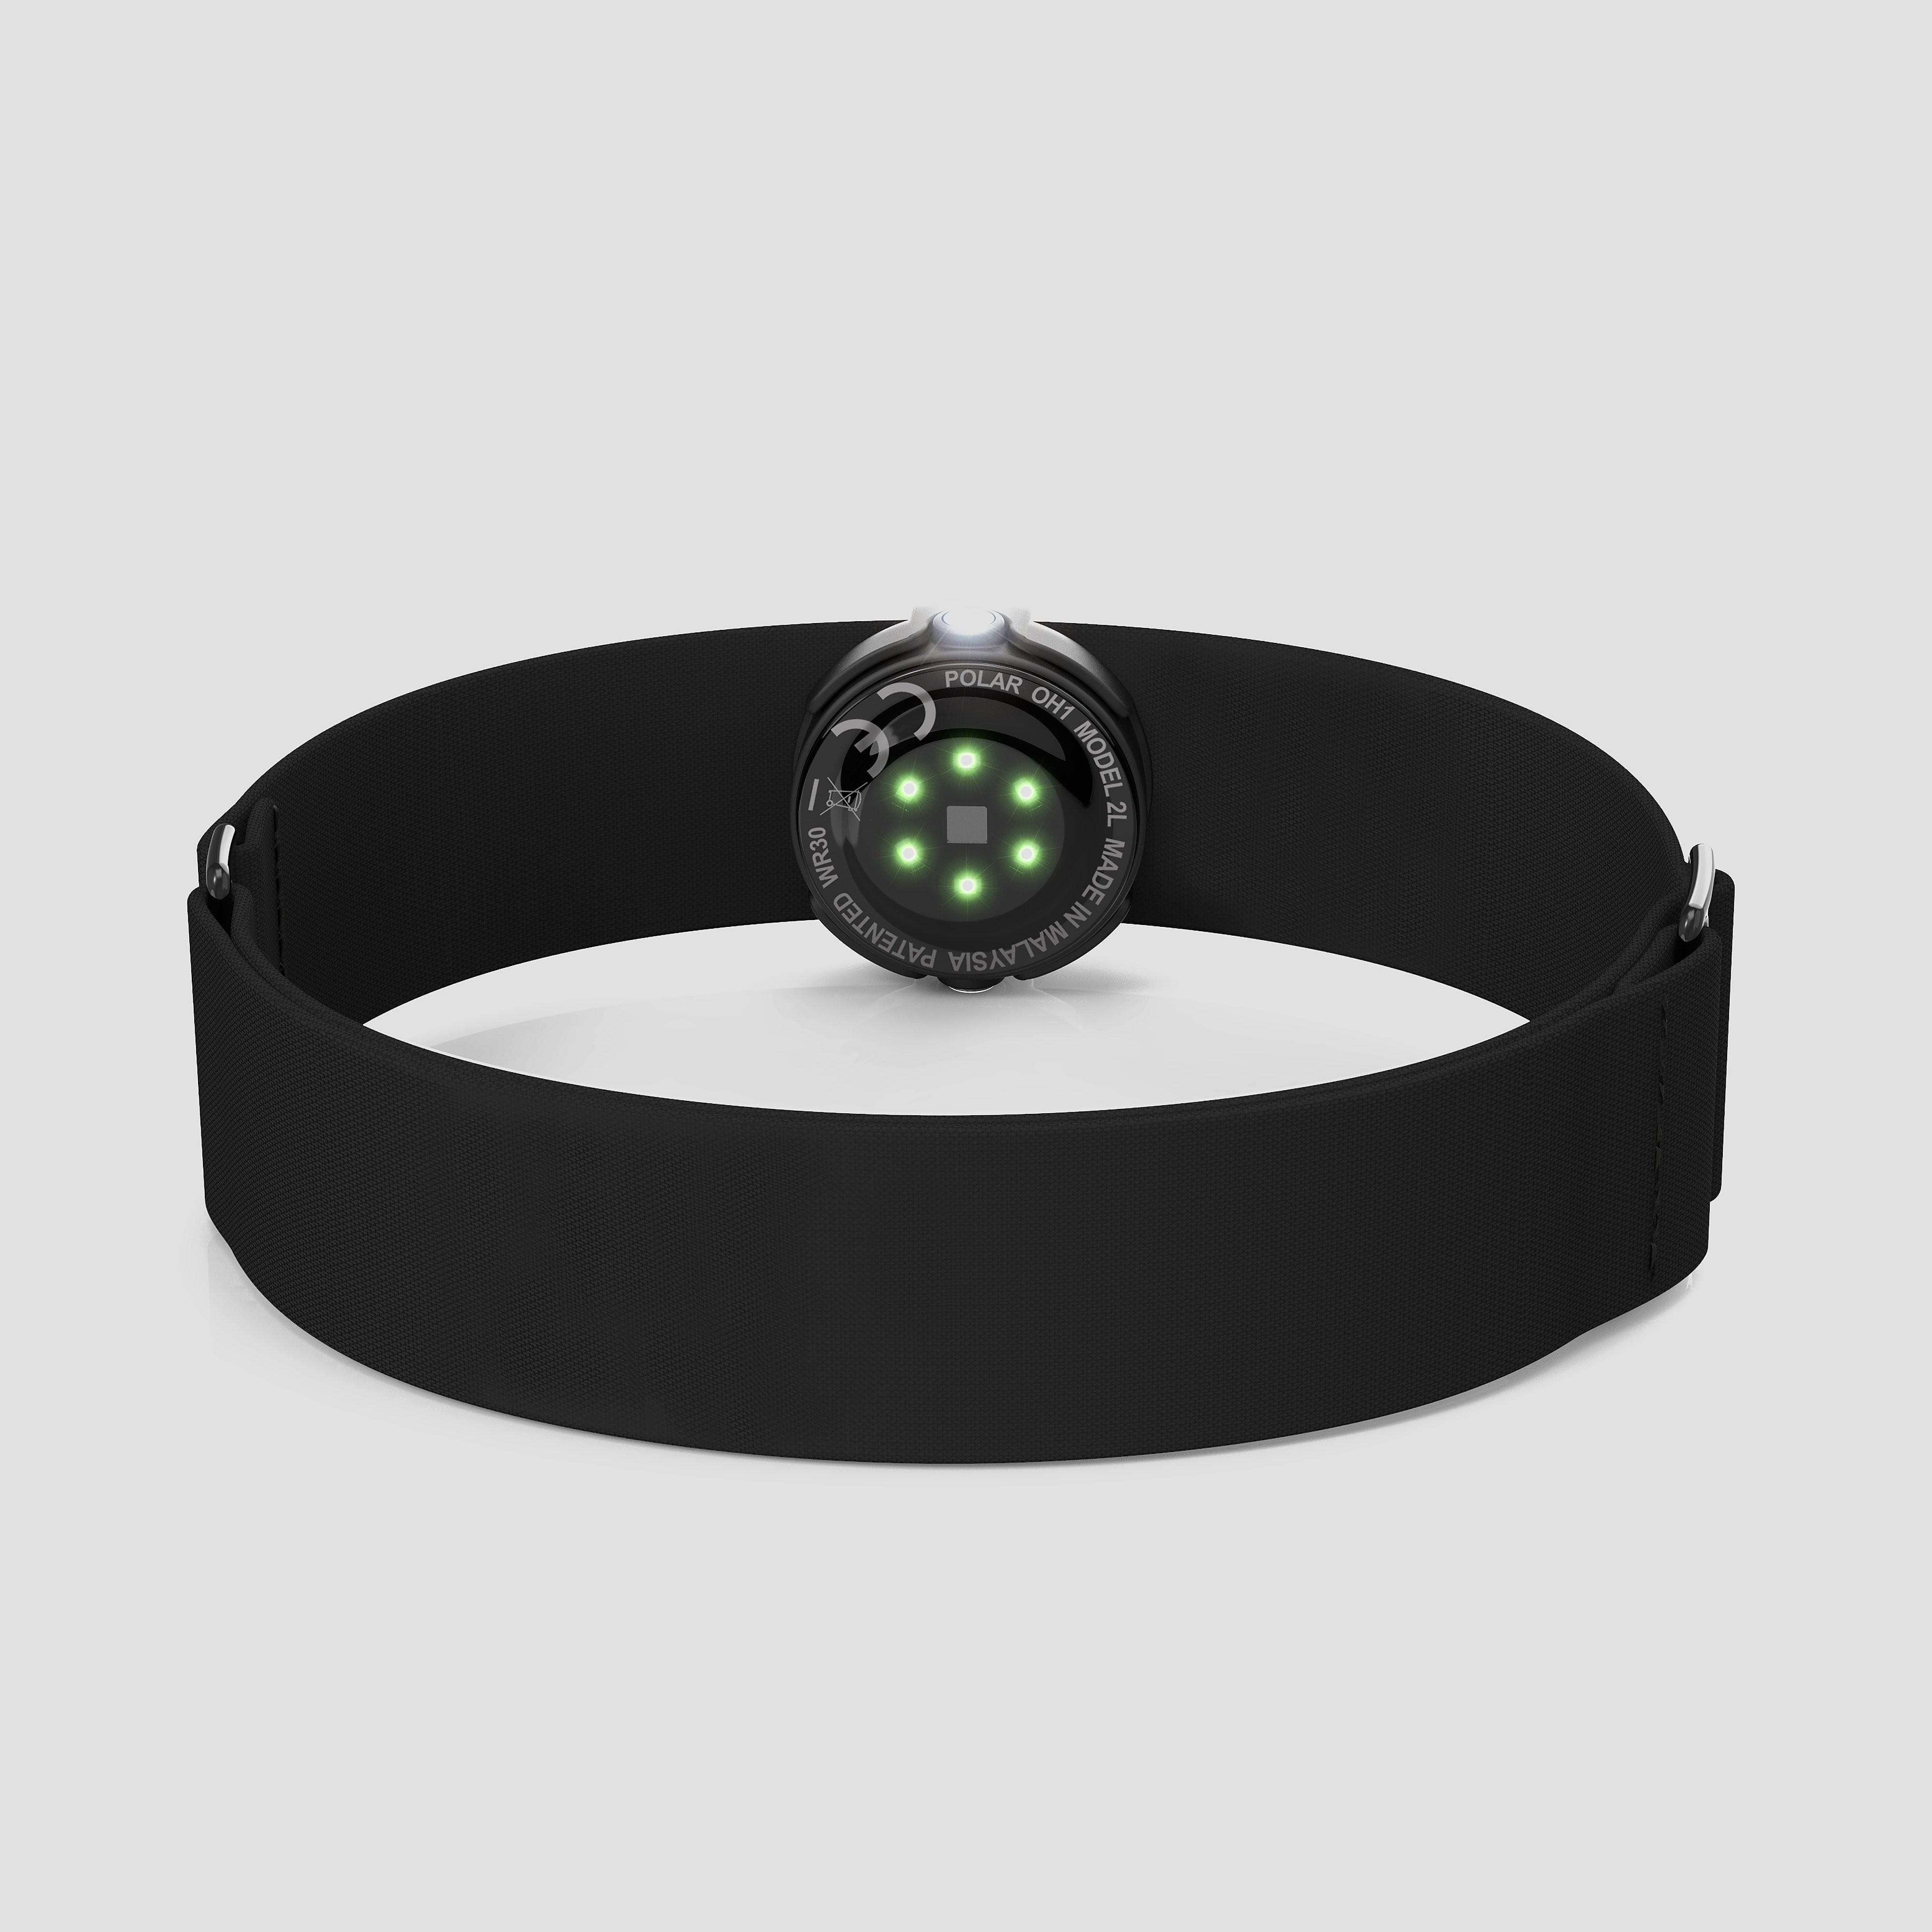 Polar OH1 Optical Heart Rate Sensor Arm Band